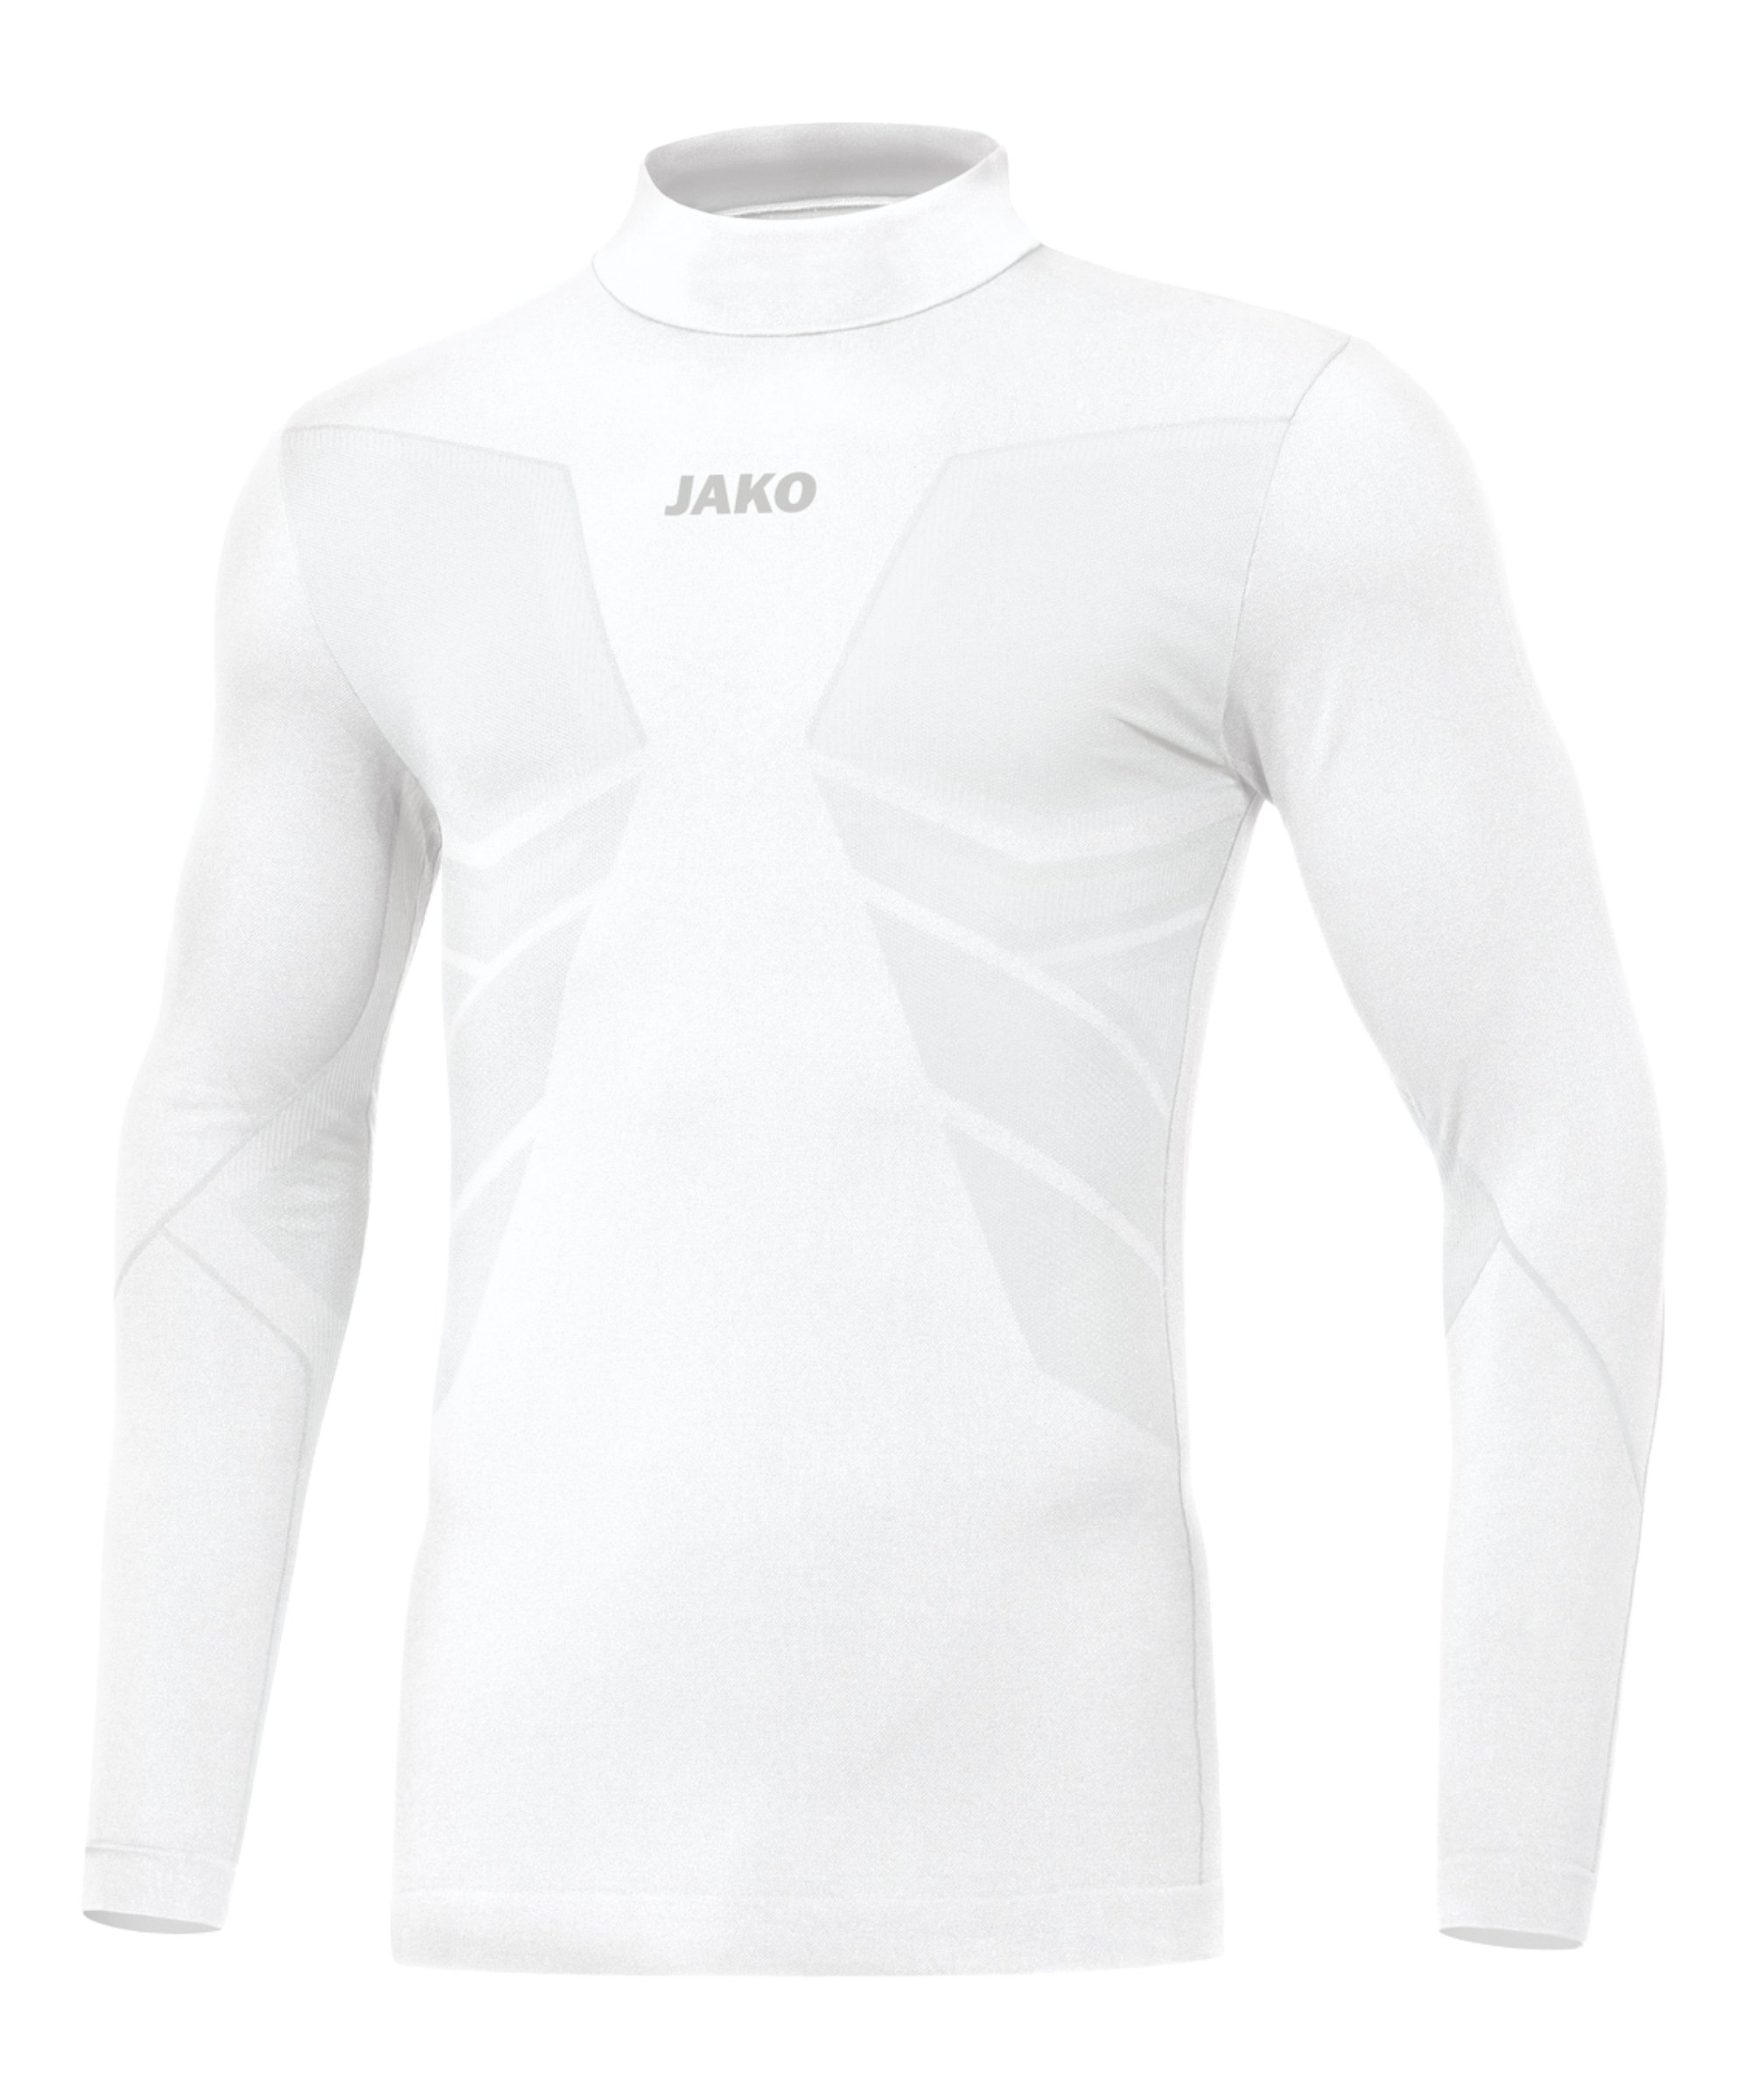 JAKO Comfort 2.0 Turtleneck Weiss F00 - weiss